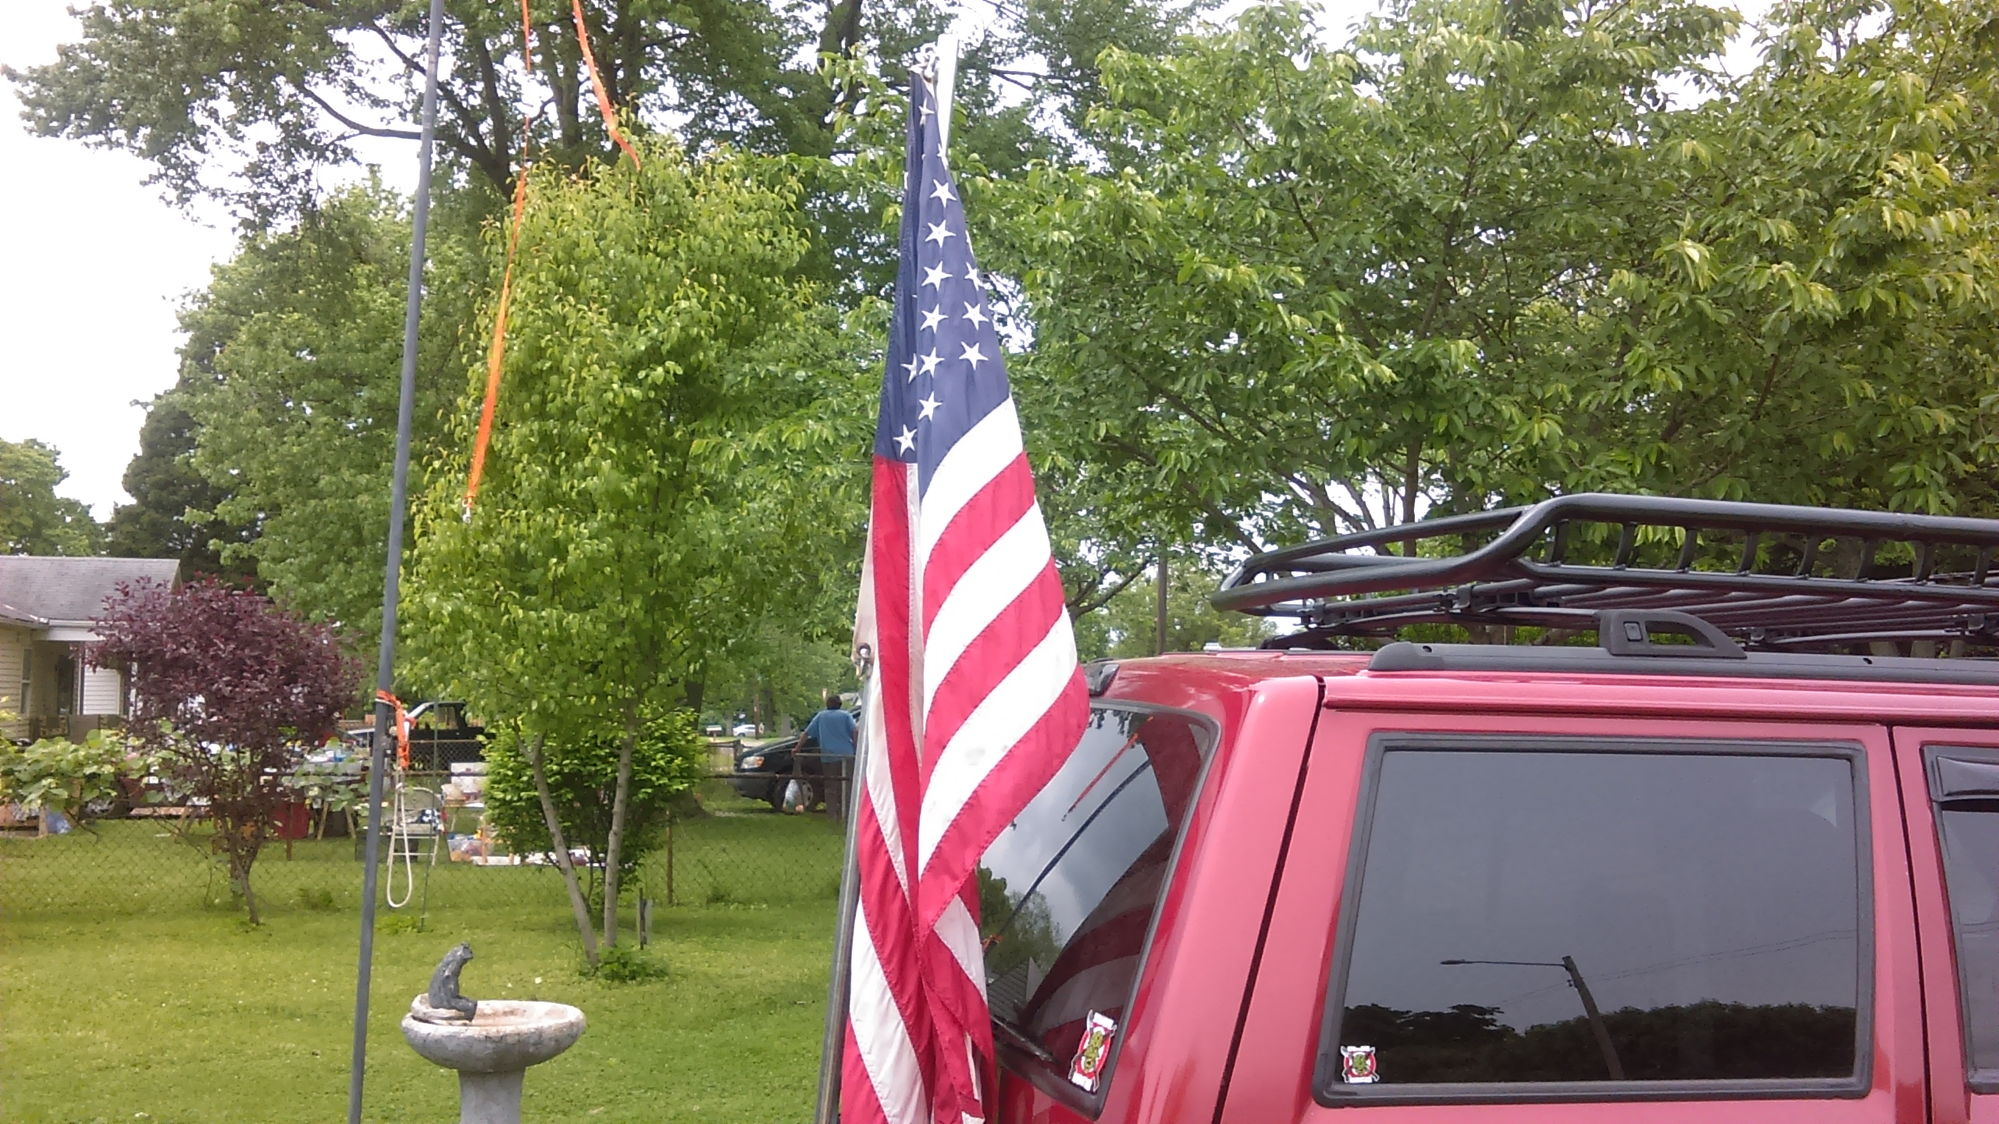 Imag Fa A F E Eb Fe F Ce Fa on Jeep Flag Pole Mount